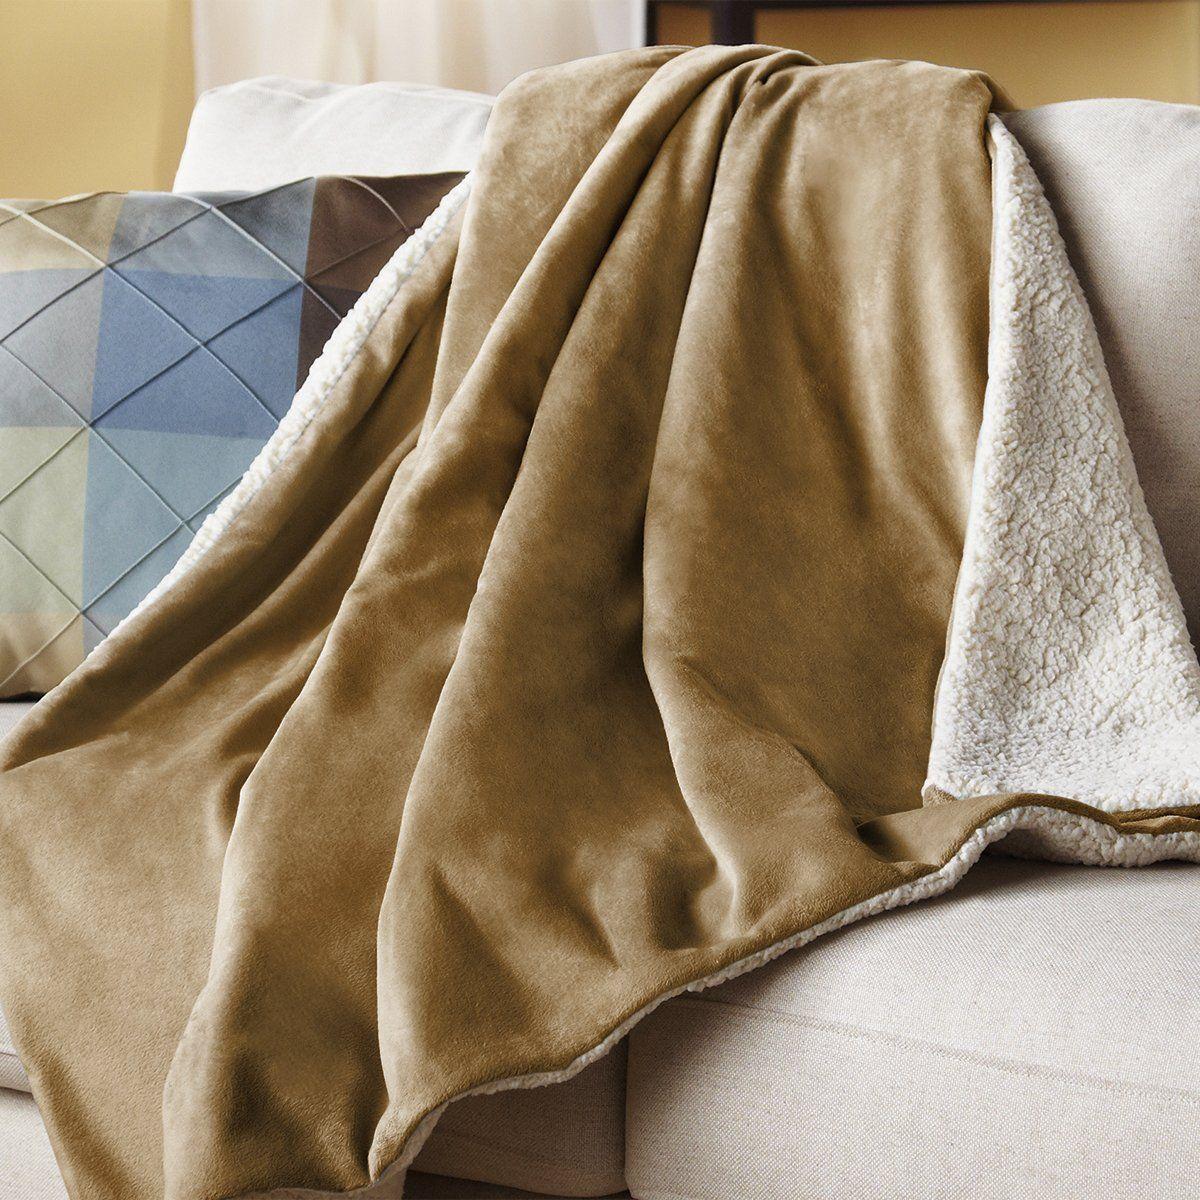 Sunbeam Reversible Sherpa Mink Heated Throw Blanket With EliteStyle II  Controller ee17215565